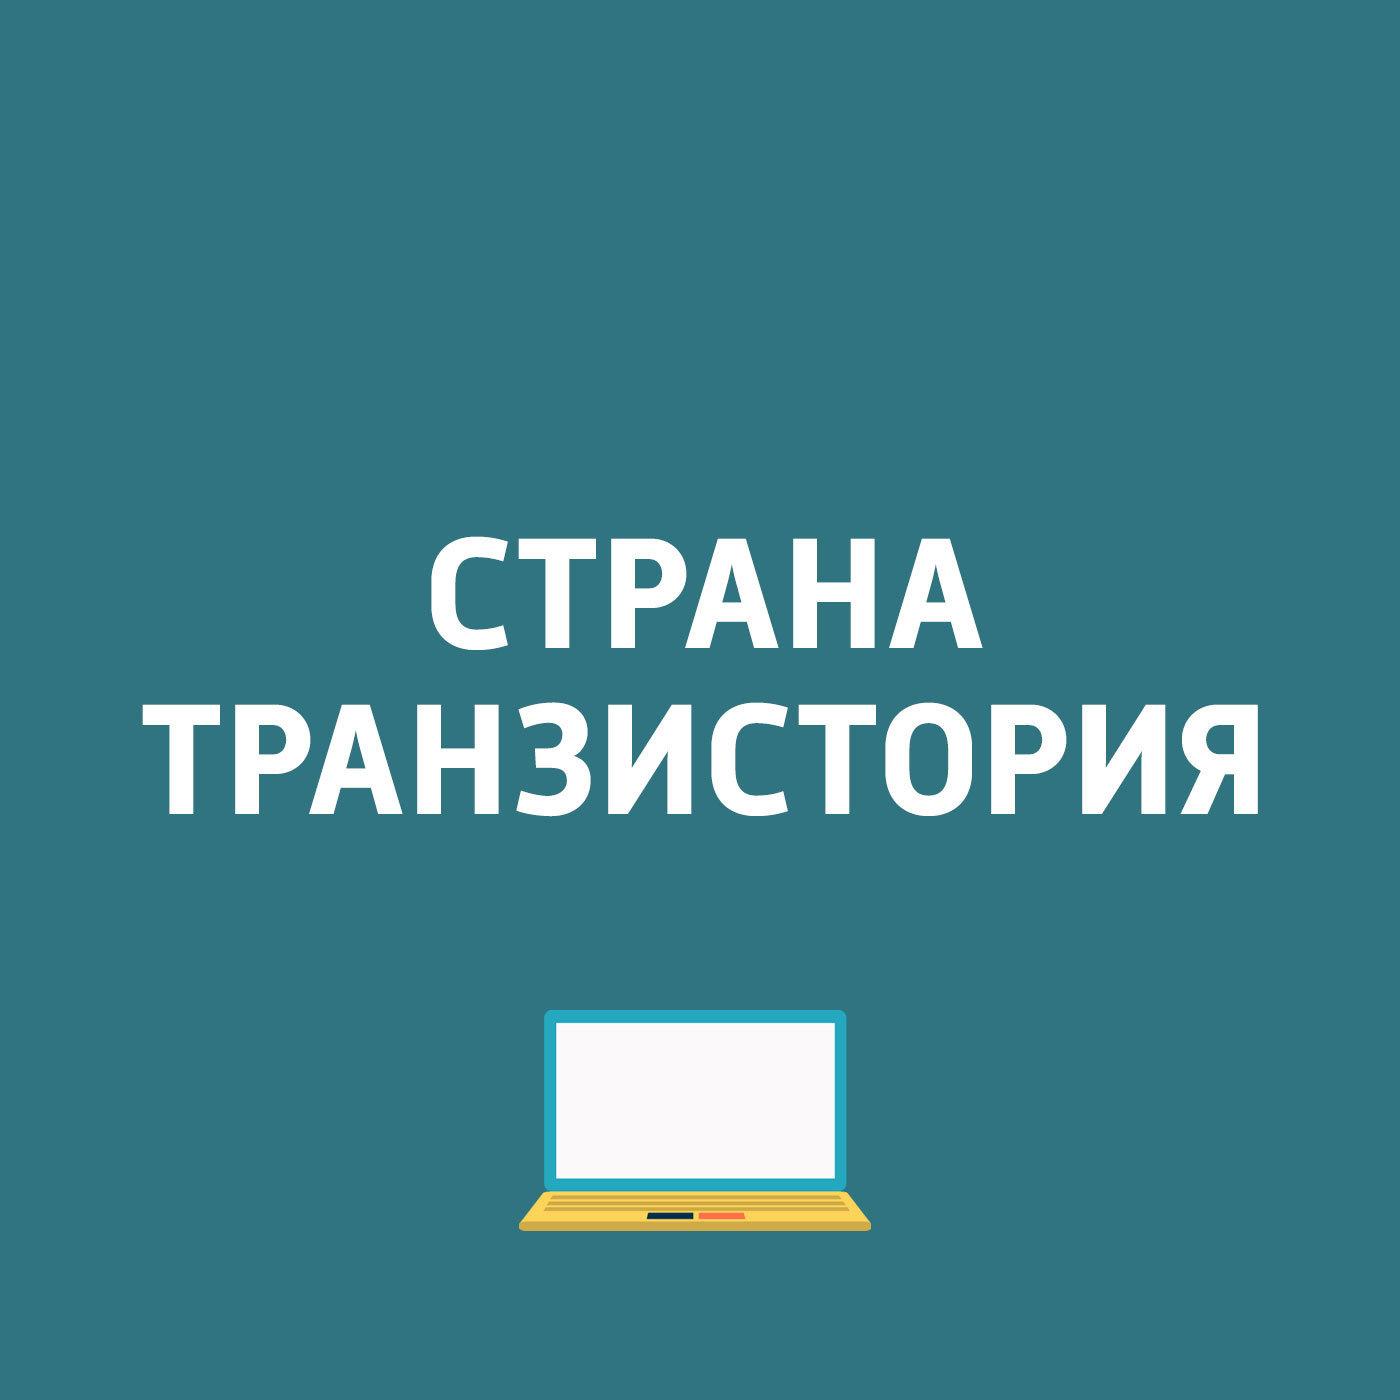 Картаев Павел Самсунг остановил производство телефона Galaxy Note 7...